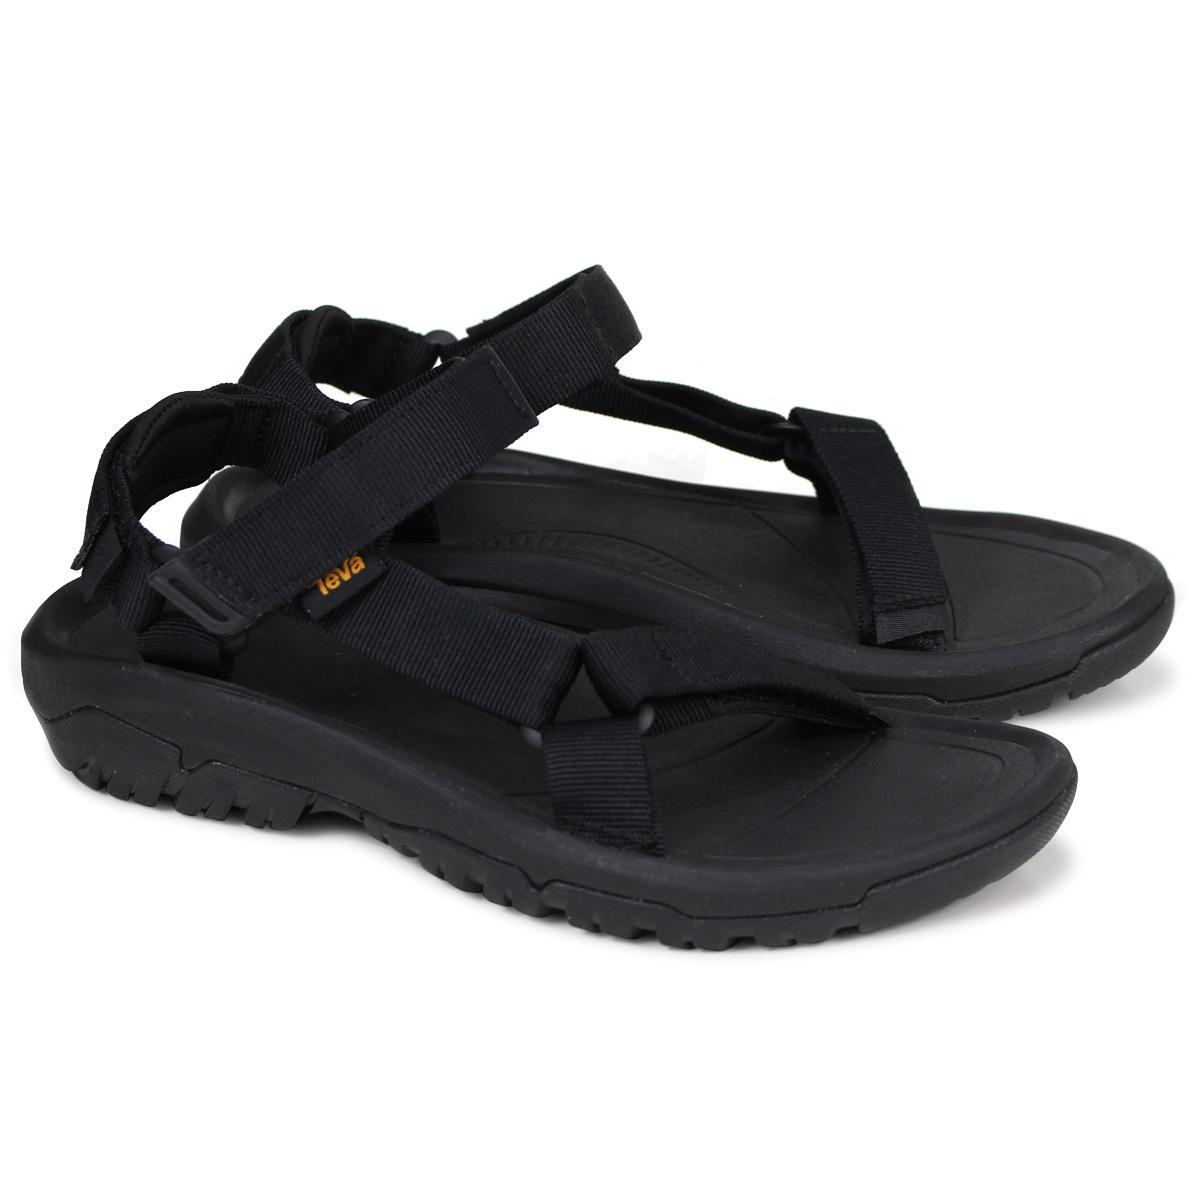 f1492c6f4c3482 ALLSPORTS  Teva HURRICANE Teva sandals Lady s hurricane XLT2 black ...